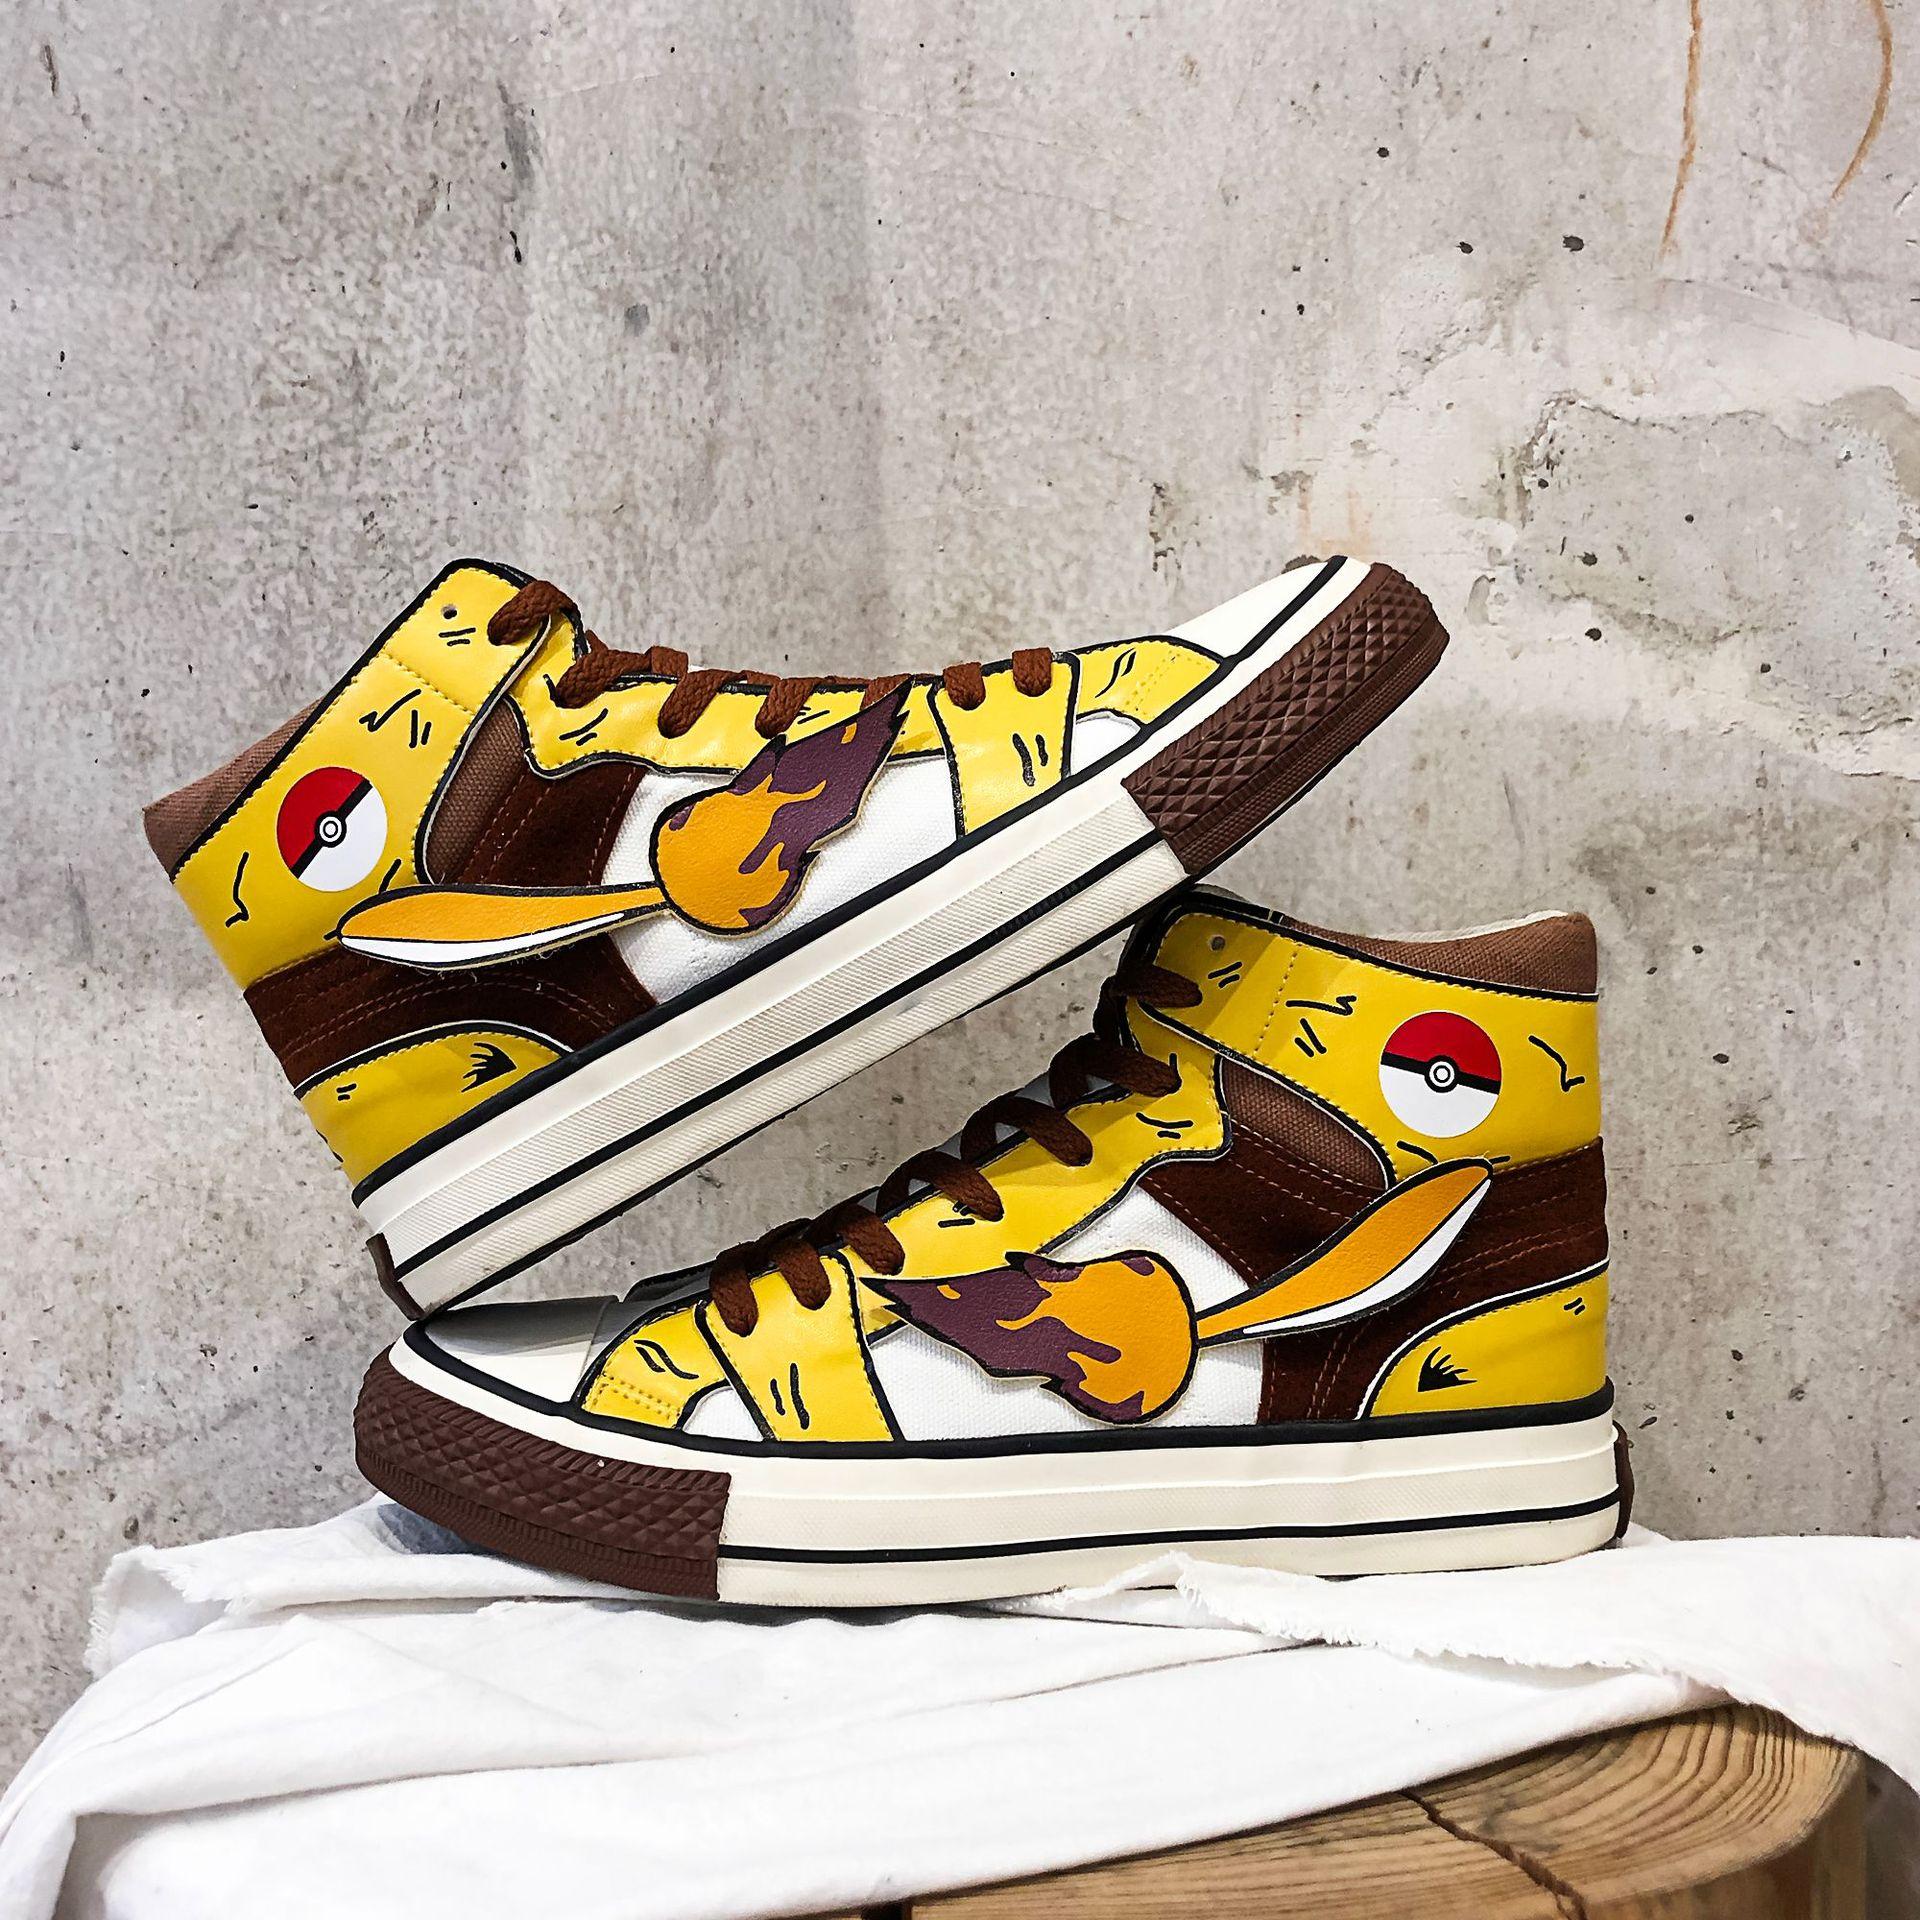 Anime Shoes